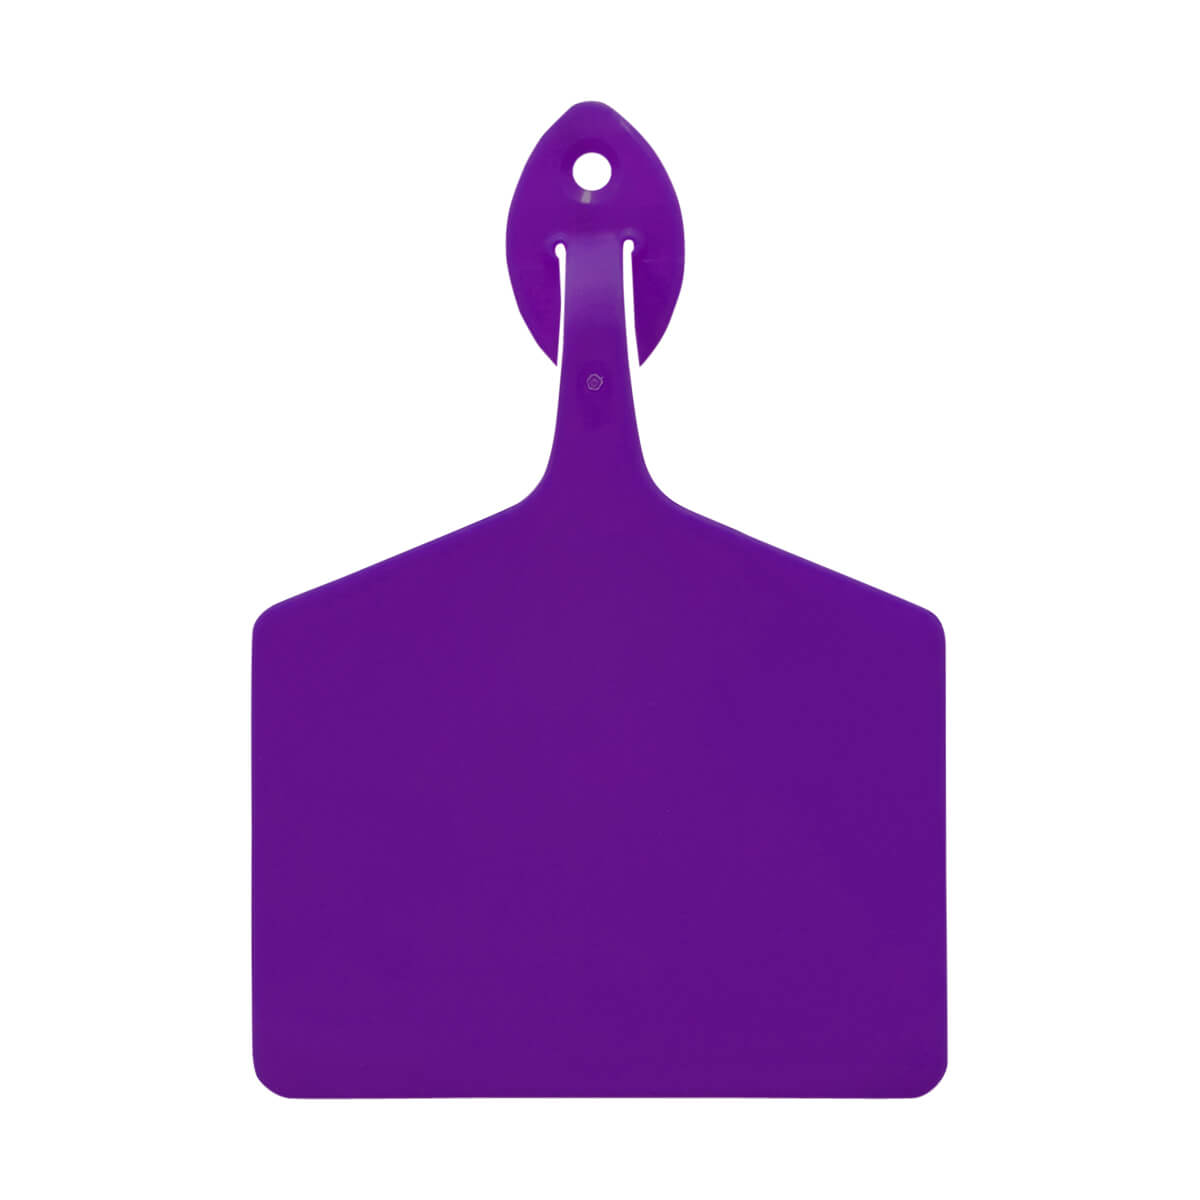 Allflex One-Piece Feedlot Tags - Dark Purple